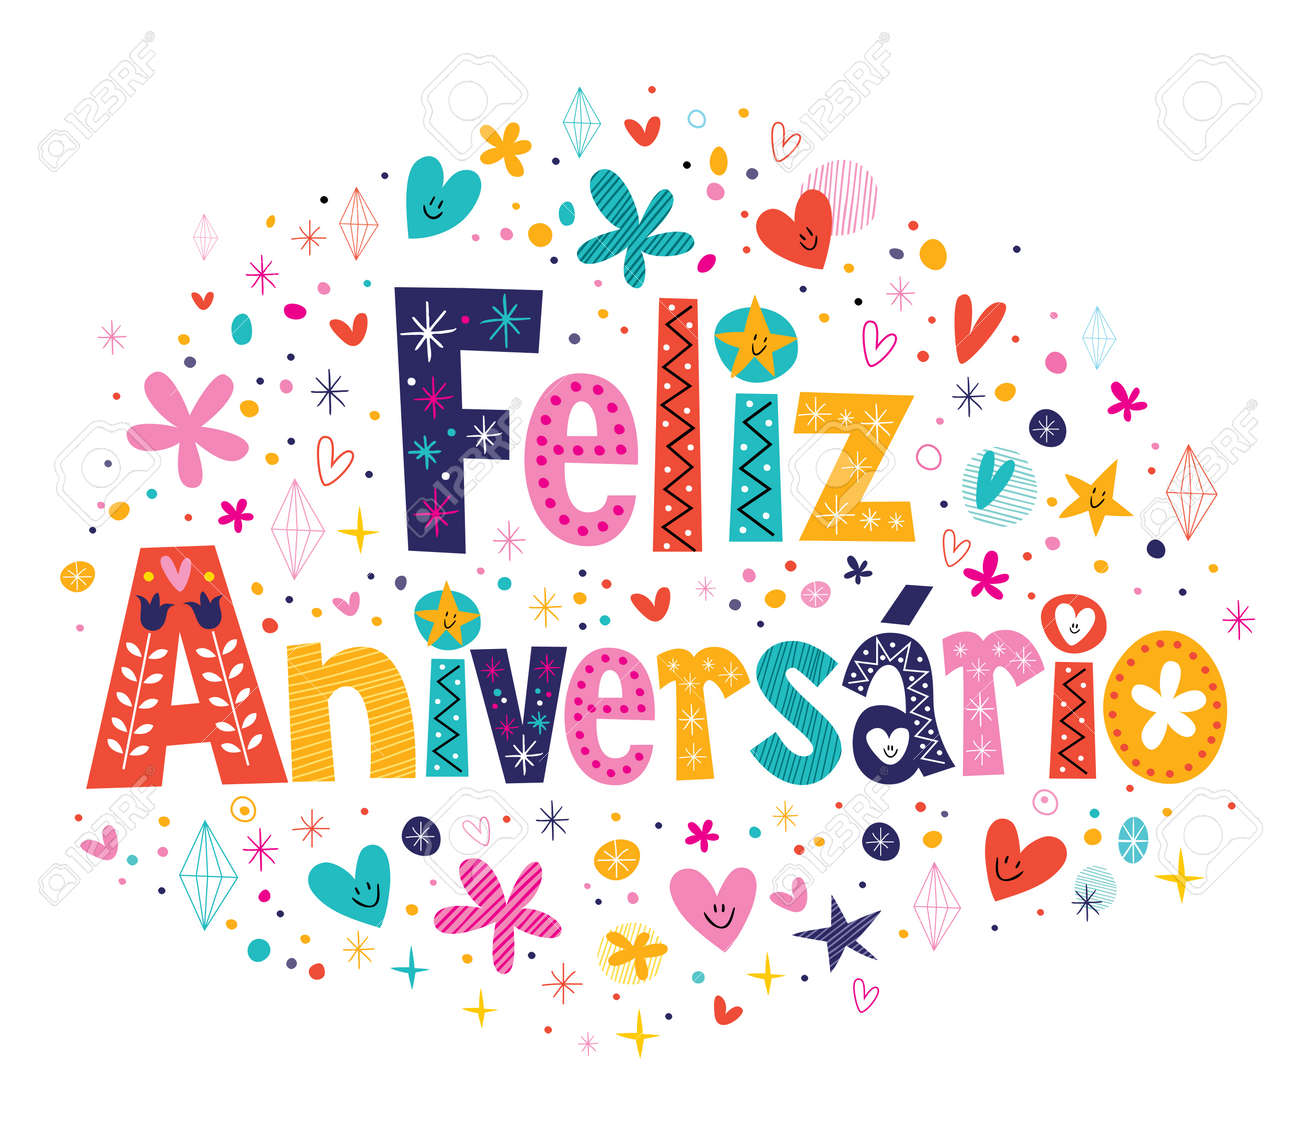 Feliz Aniversario Portuguese Happy Birthday Card Royalty Free Cliparts Vectors And Stock Illustration Image 33669625